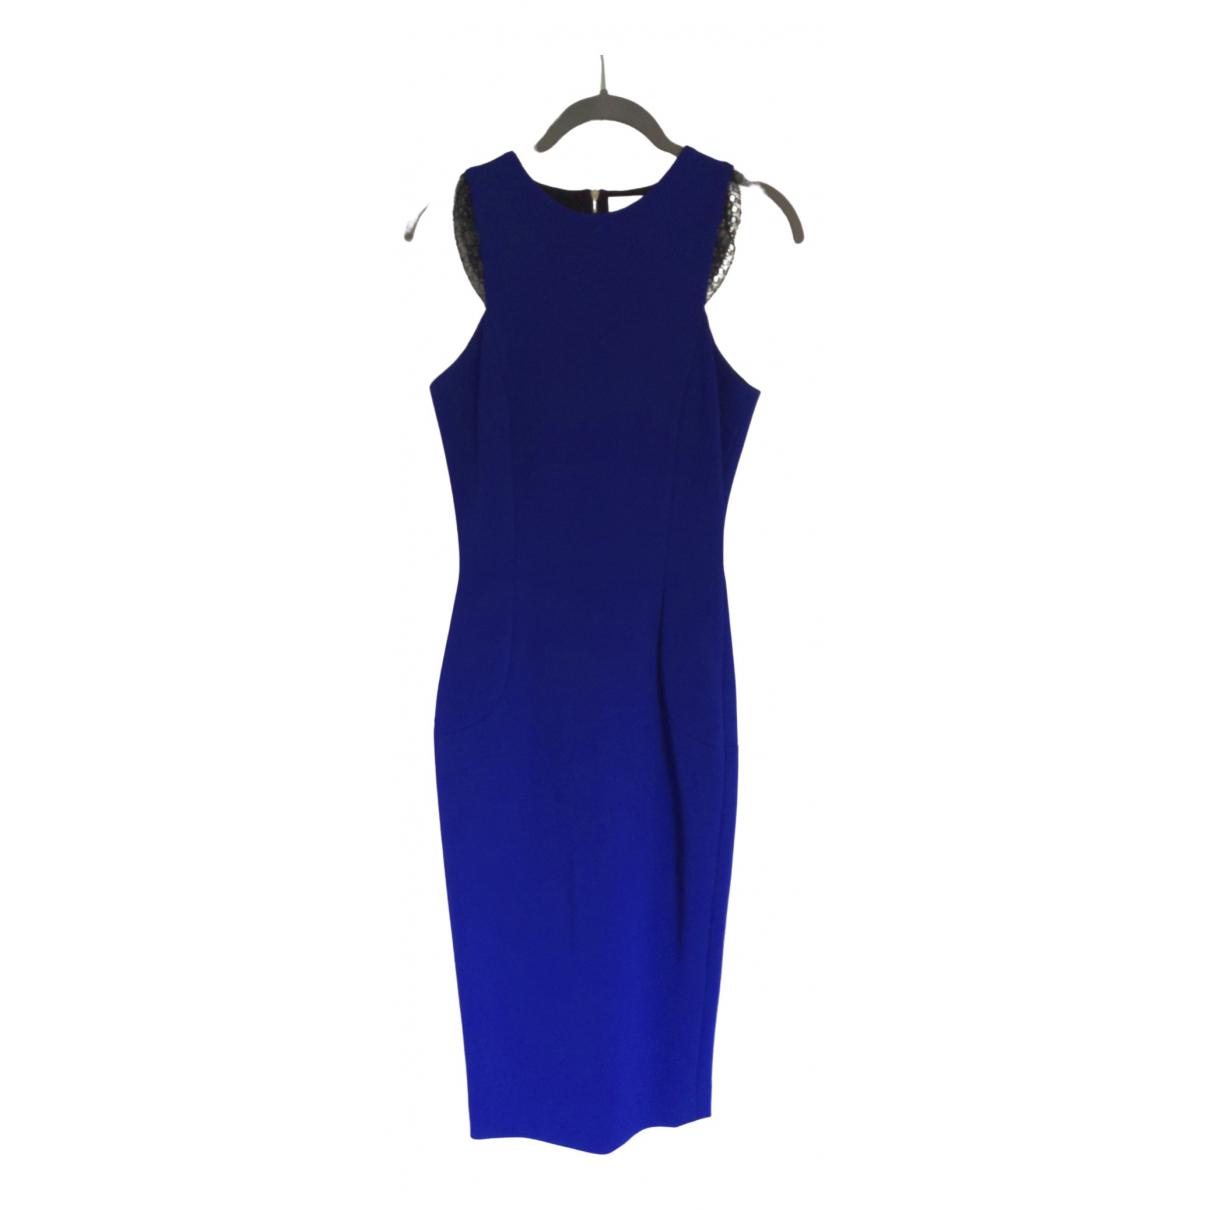 Victoria Beckham \N Kleid in  Blau Viskose